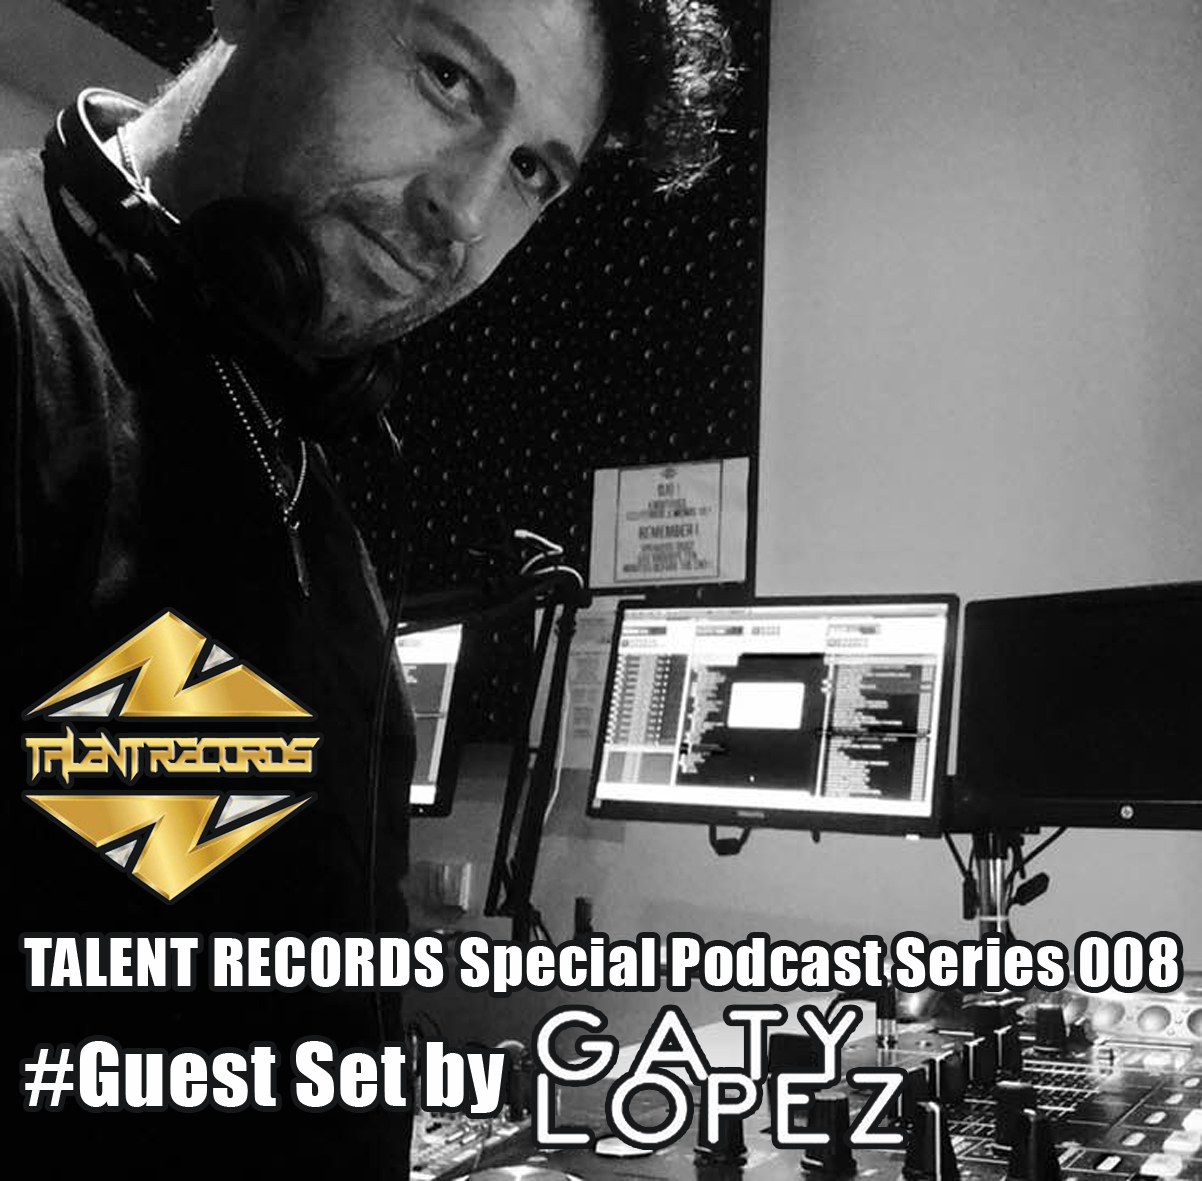 gaty lopez talent records podcast cover.jpg